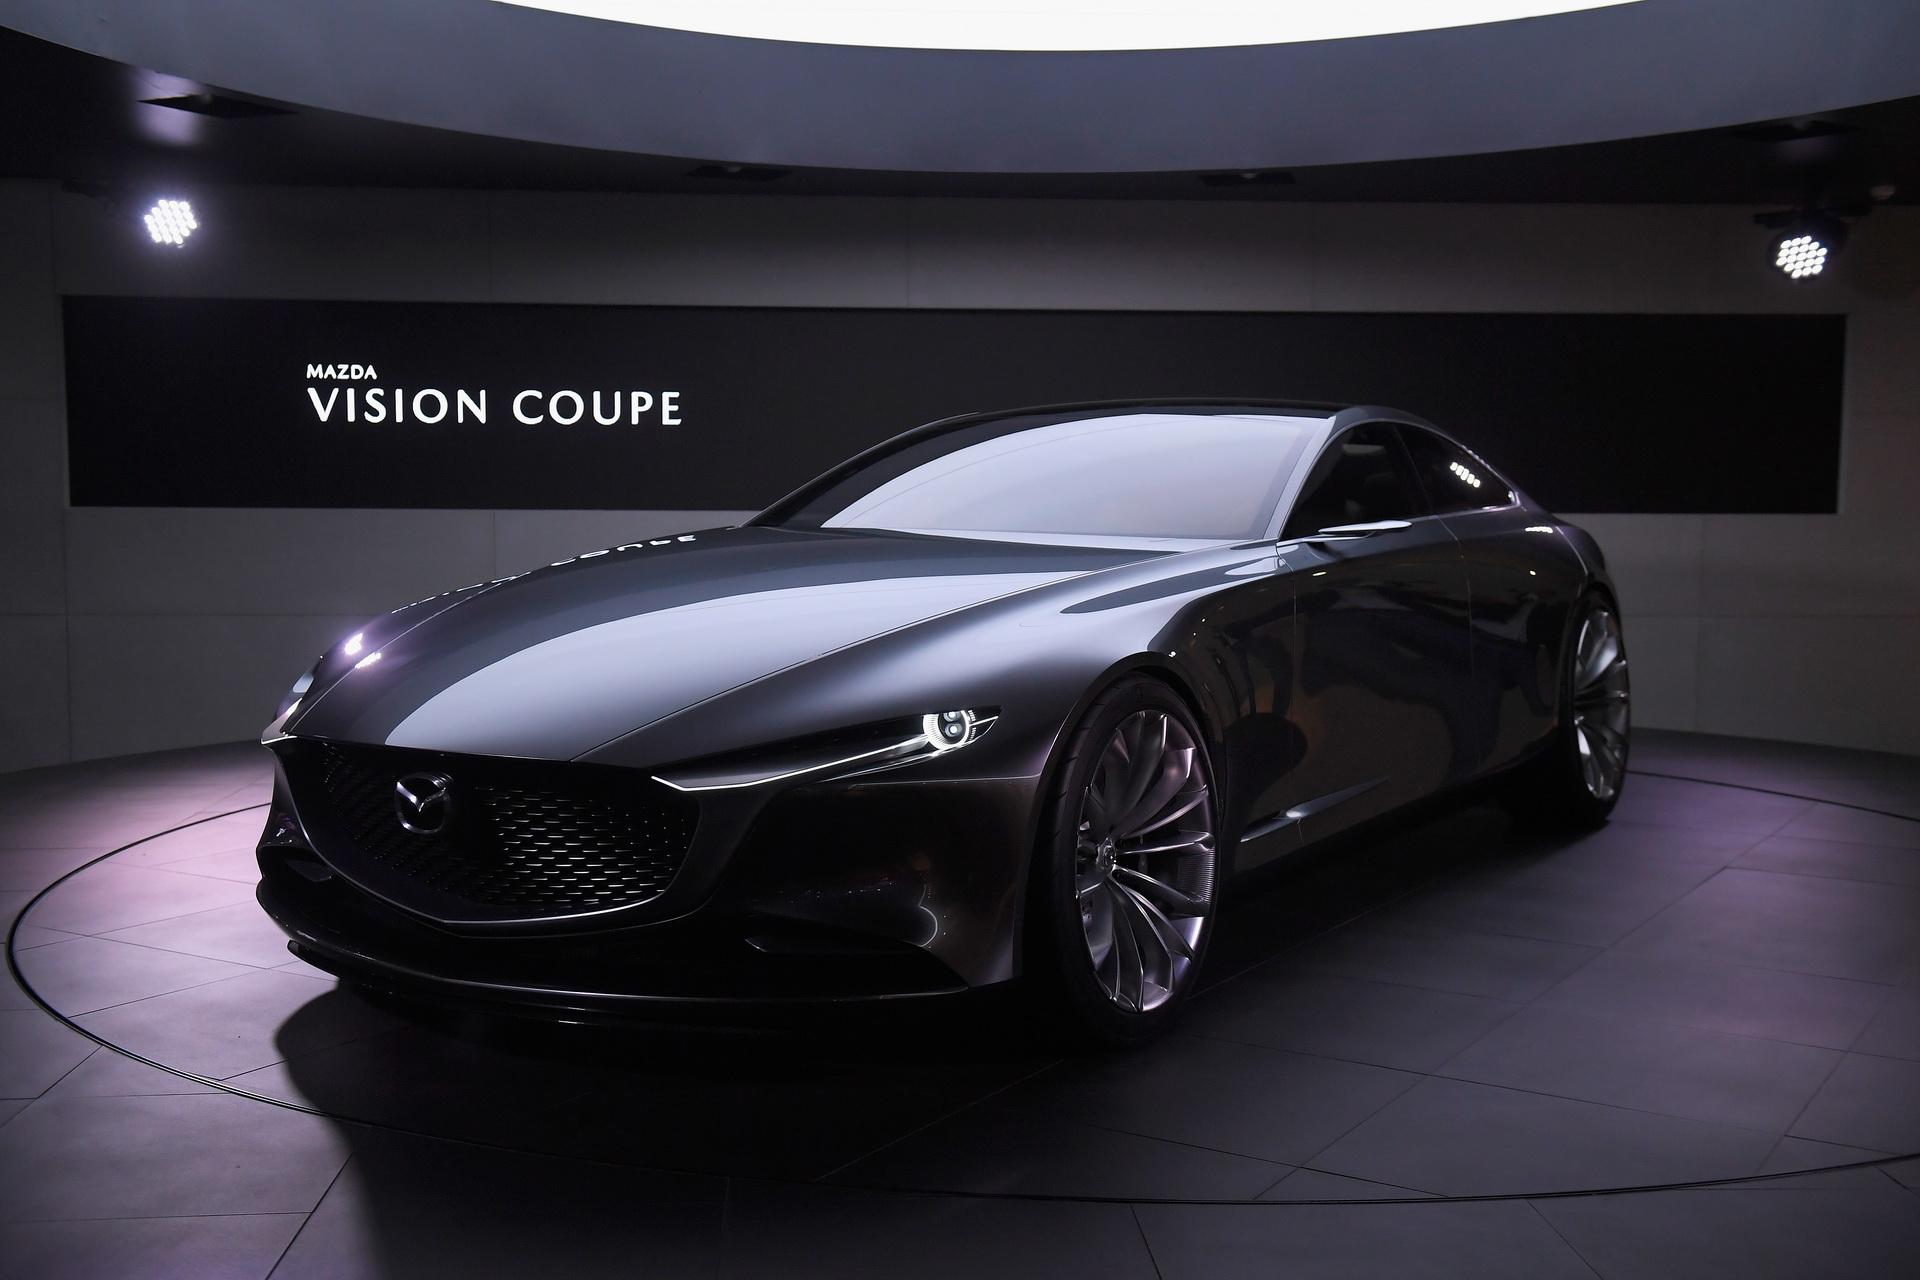 Mazda-Vision-Coupe-Sedan-1